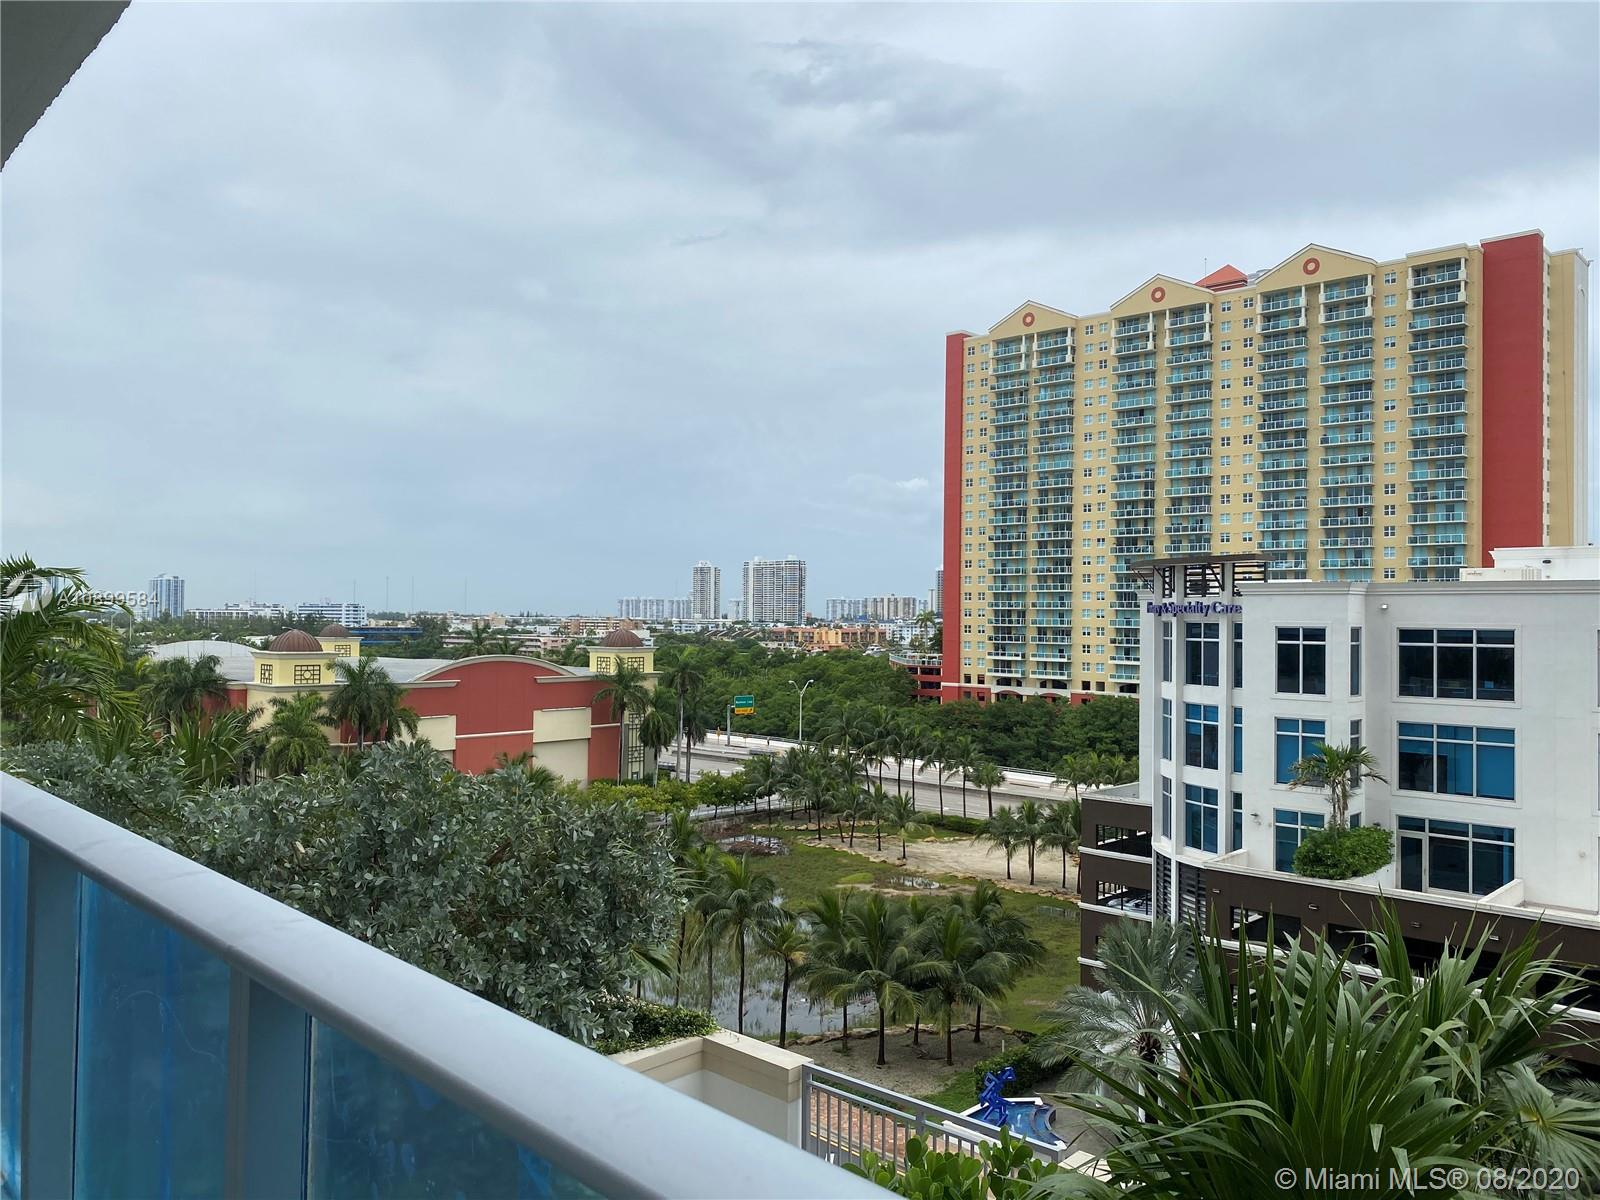 Parque Tower 2 #5-605 - 330 Sunny Isle Blvd #5-605, Sunny Isles Beach, FL 33160